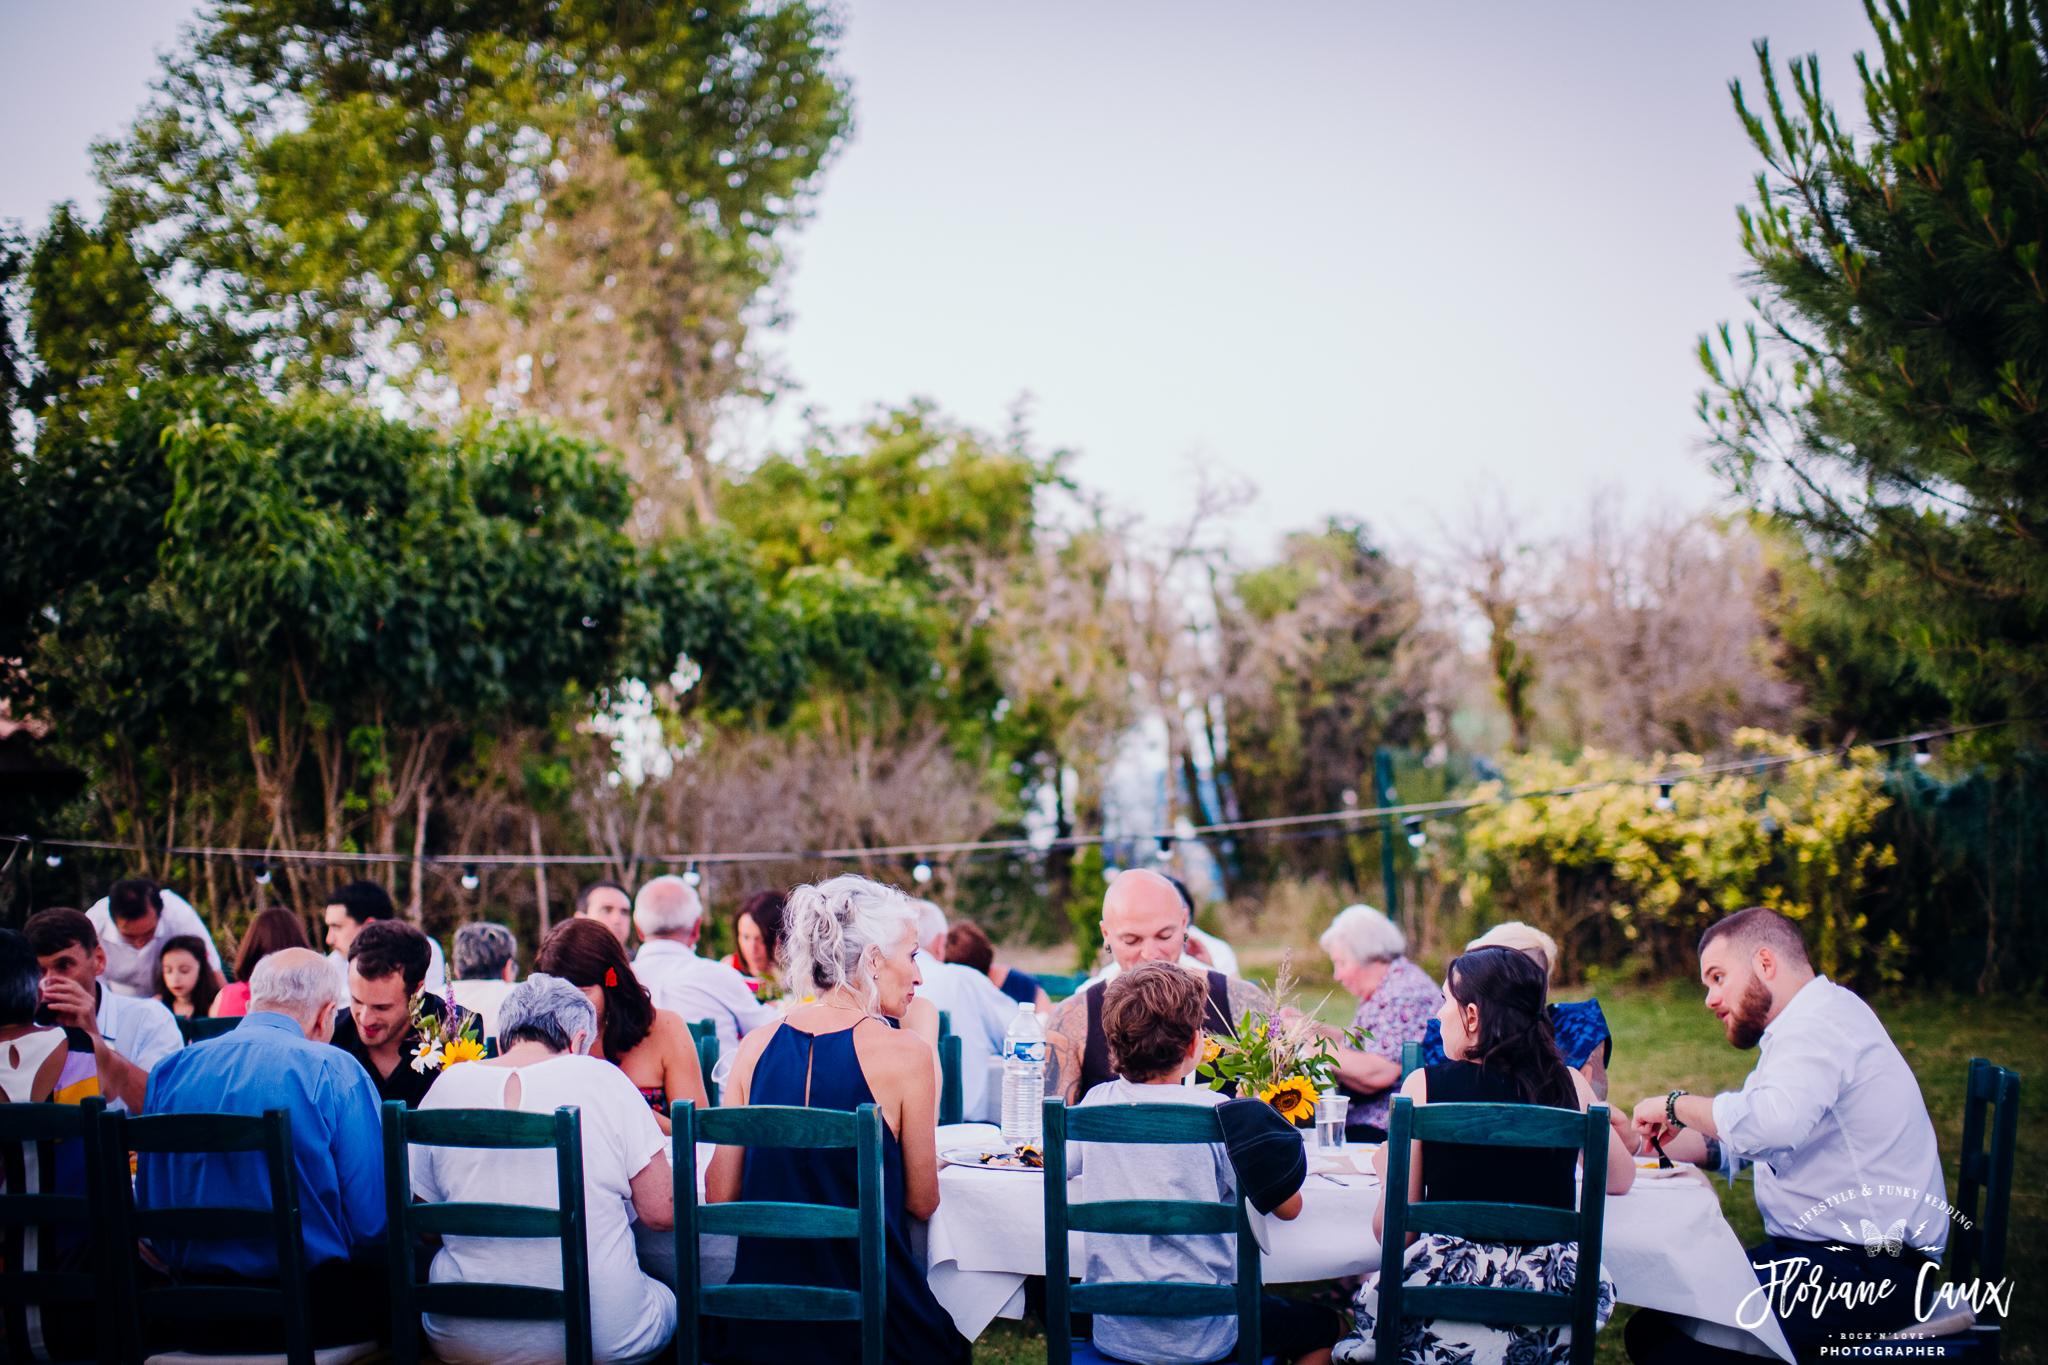 photographe-mariage-toulouse-rocknroll-maries-tatoues-floriane-caux-114